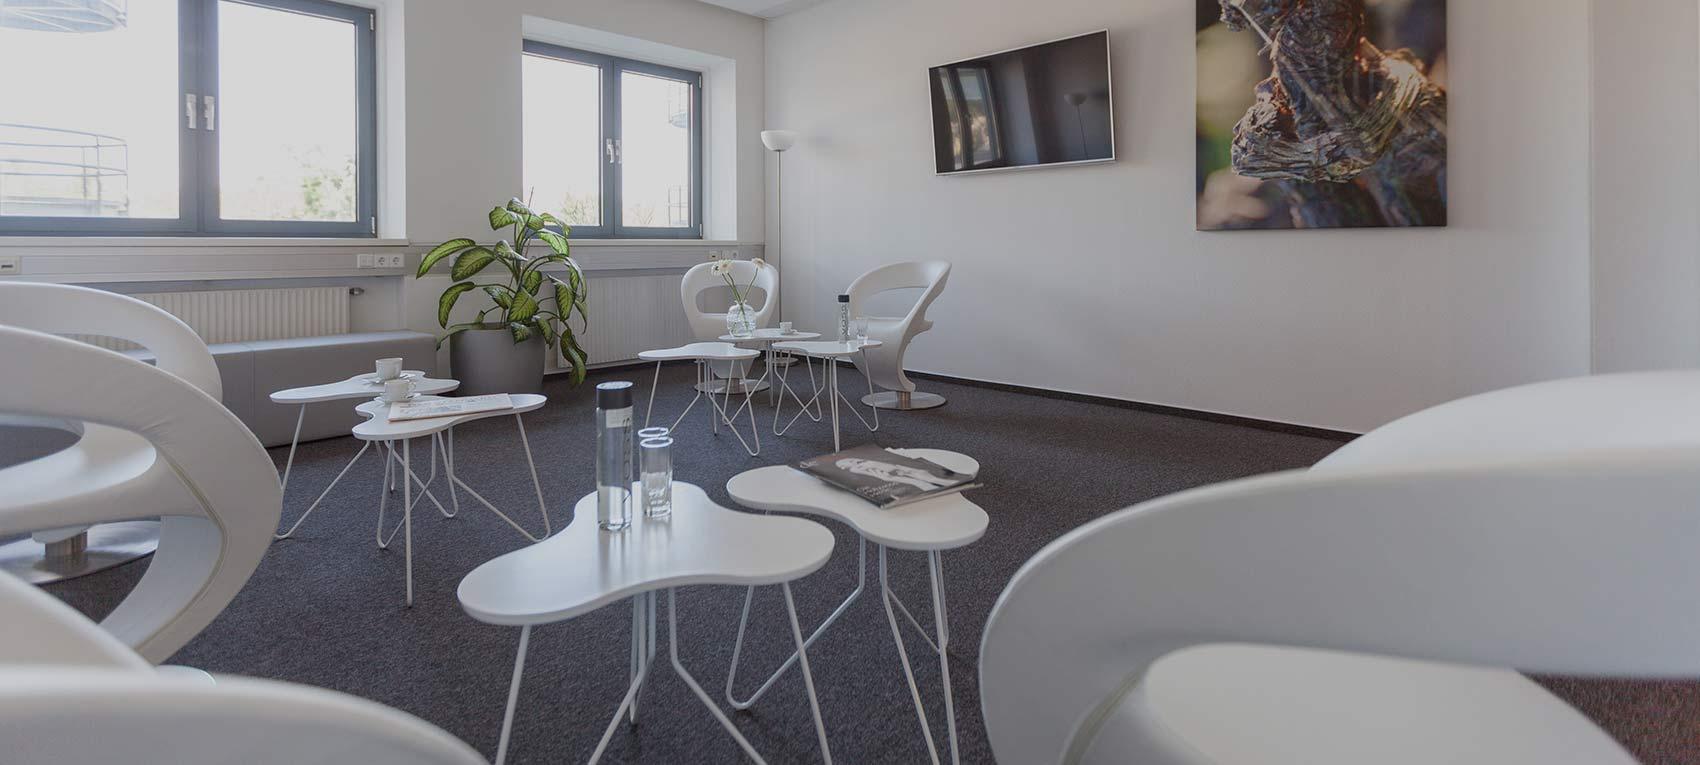 Büros in Wien mieten Slider1